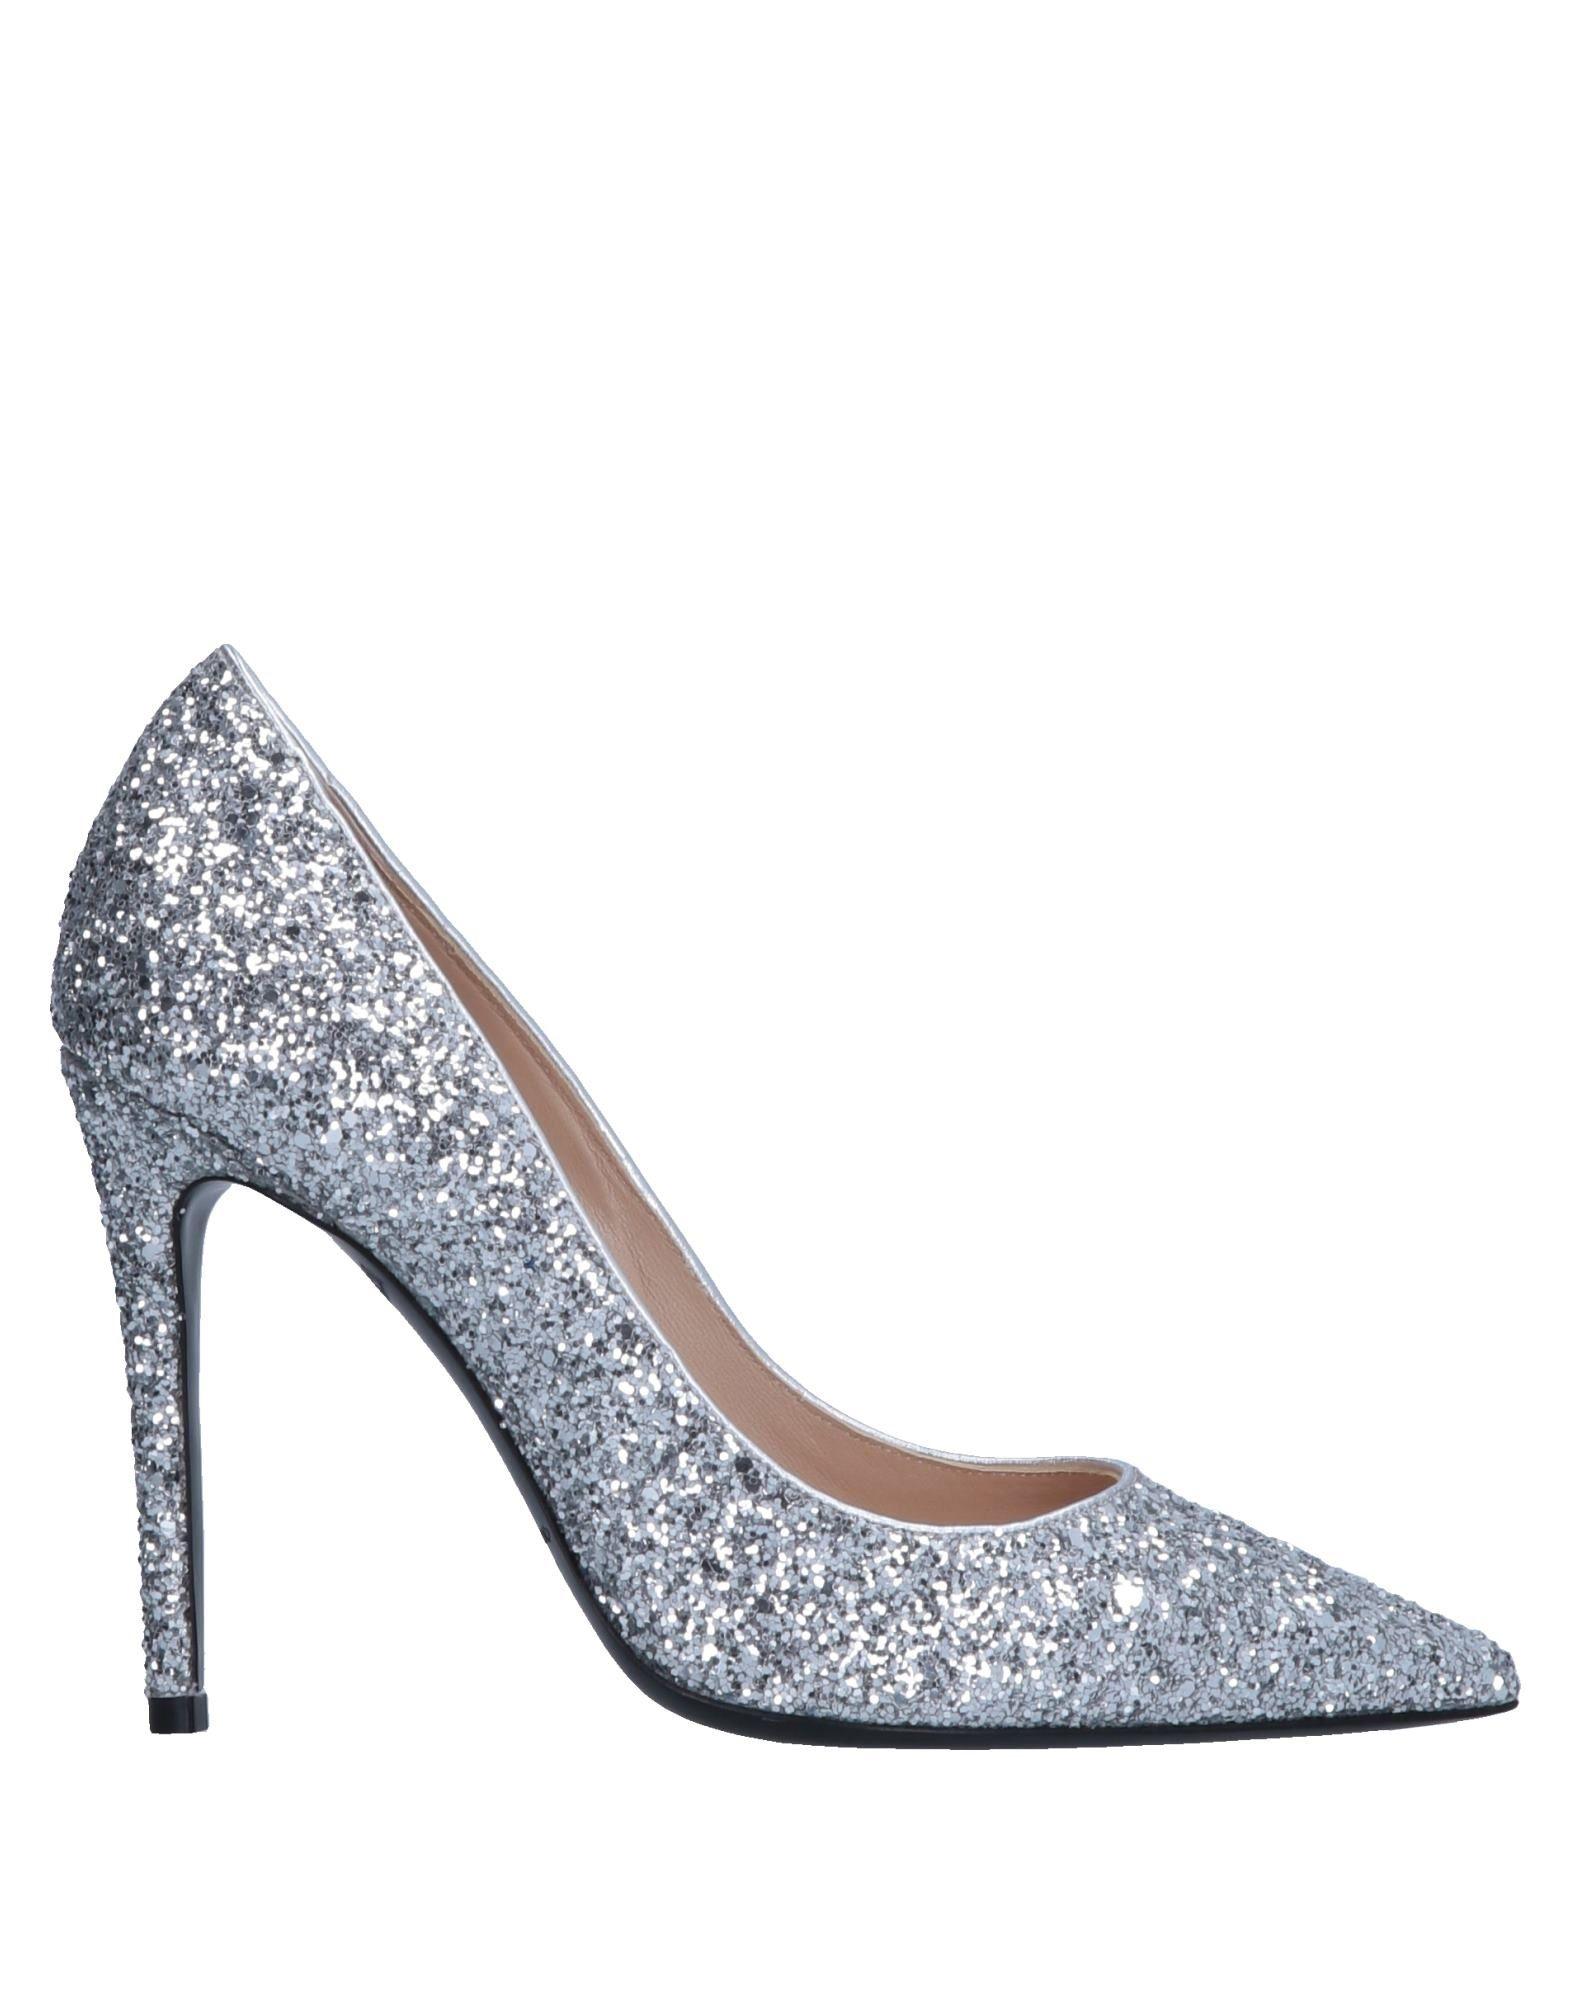 Mocassino Cult Donna - 11477016XS comode Nuove offerte e scarpe comode 11477016XS 04f975